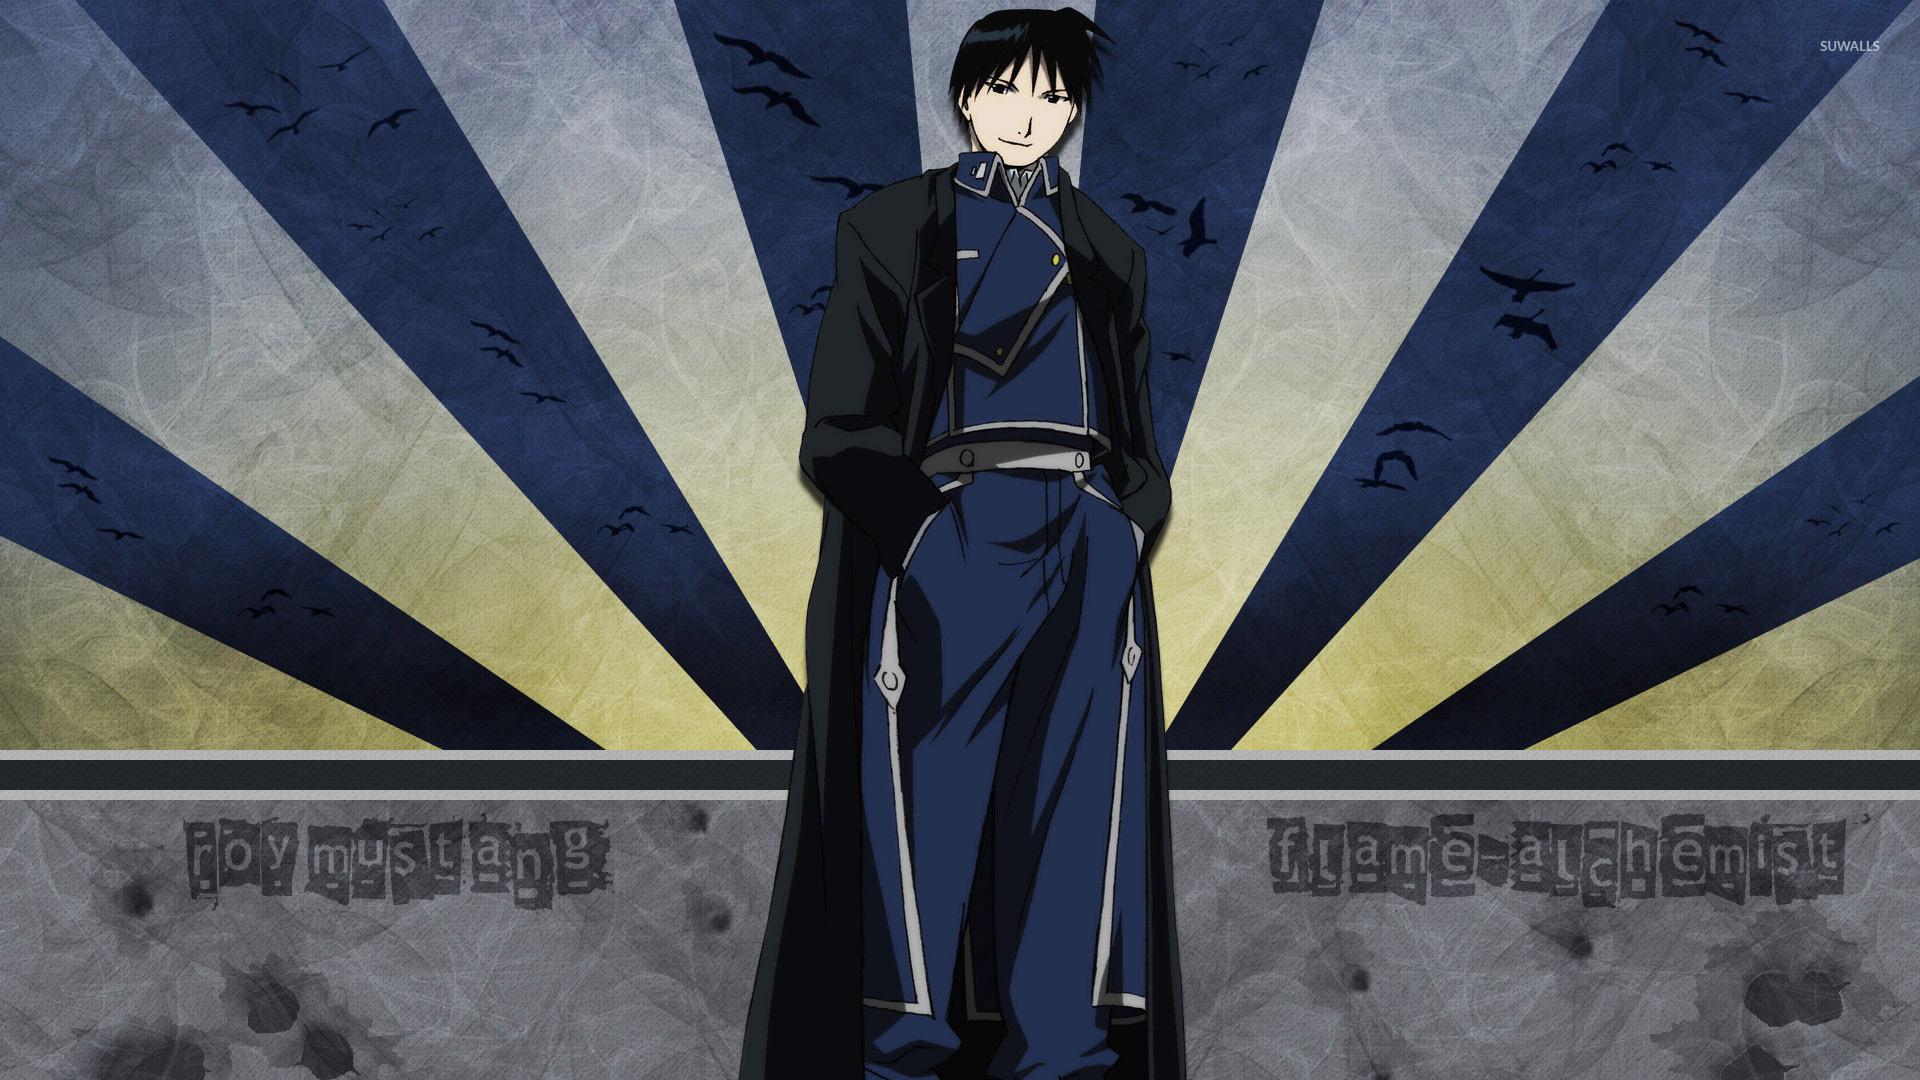 The Alchemist Quotes Wallpaper Roy Mustang Fullmetal Alchemist 2 Wallpaper Anime